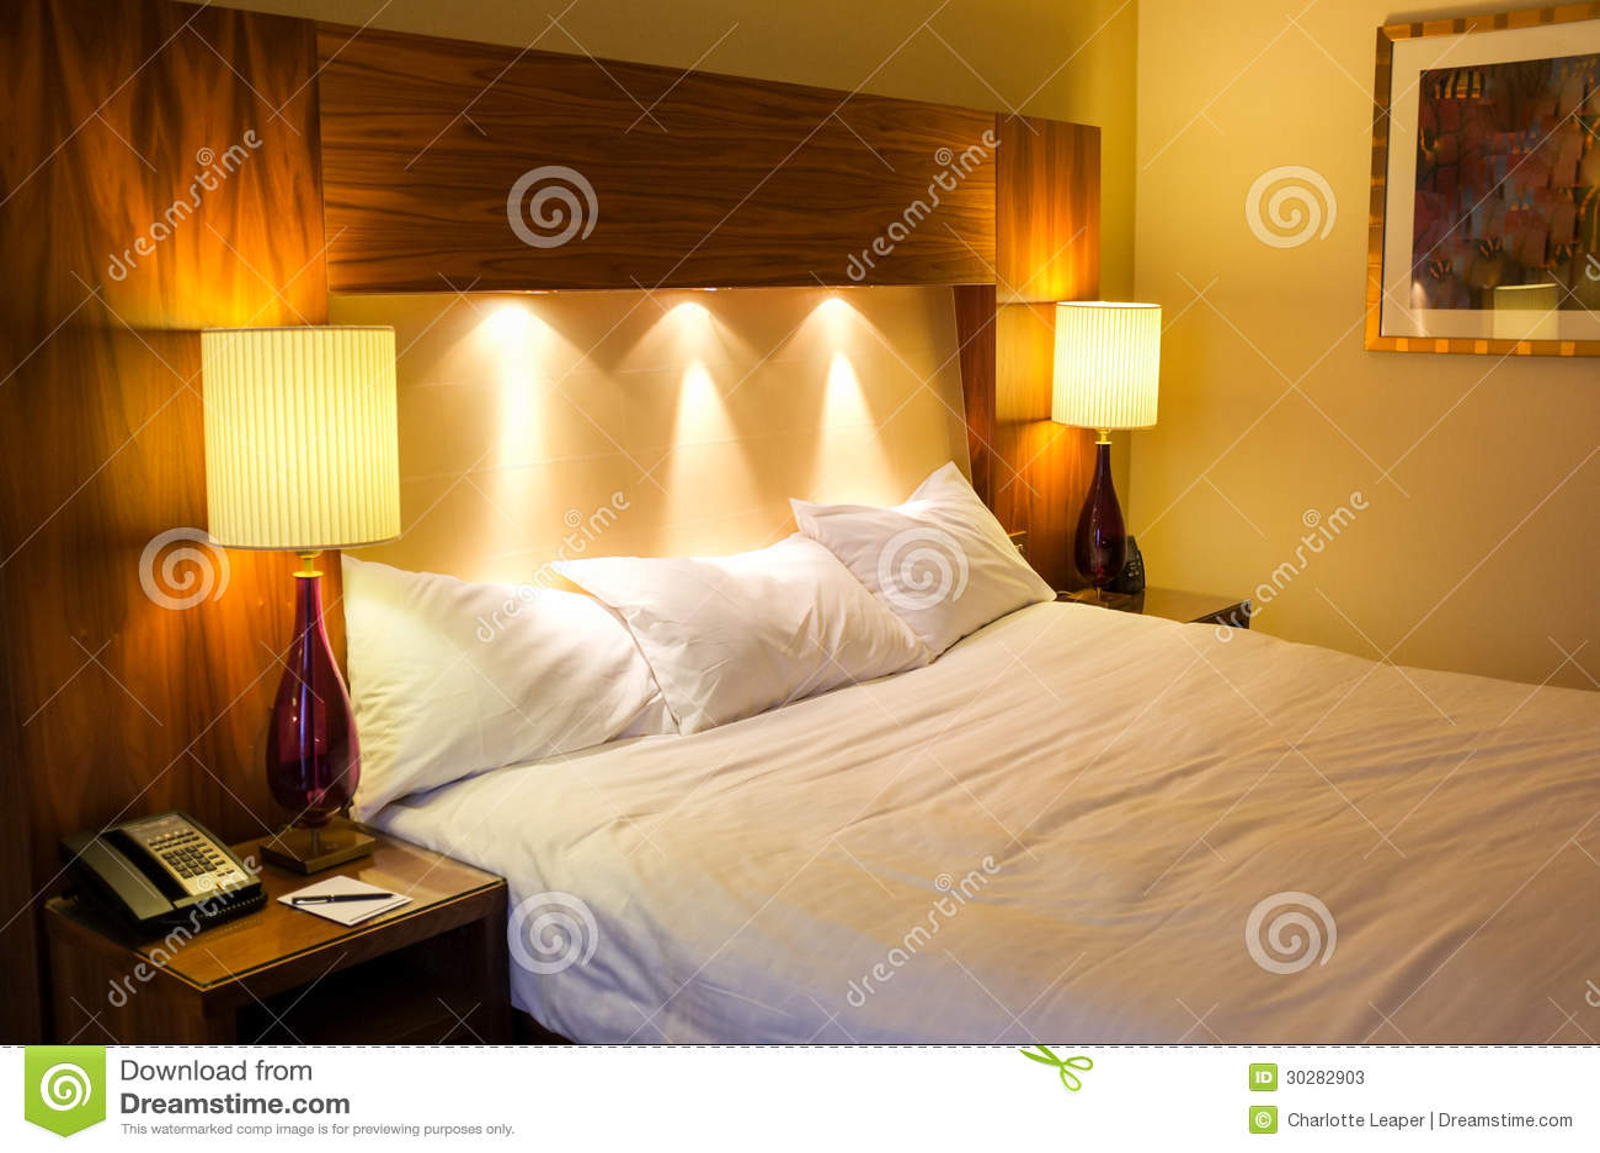 hotel bedroom stock photos image 30282903